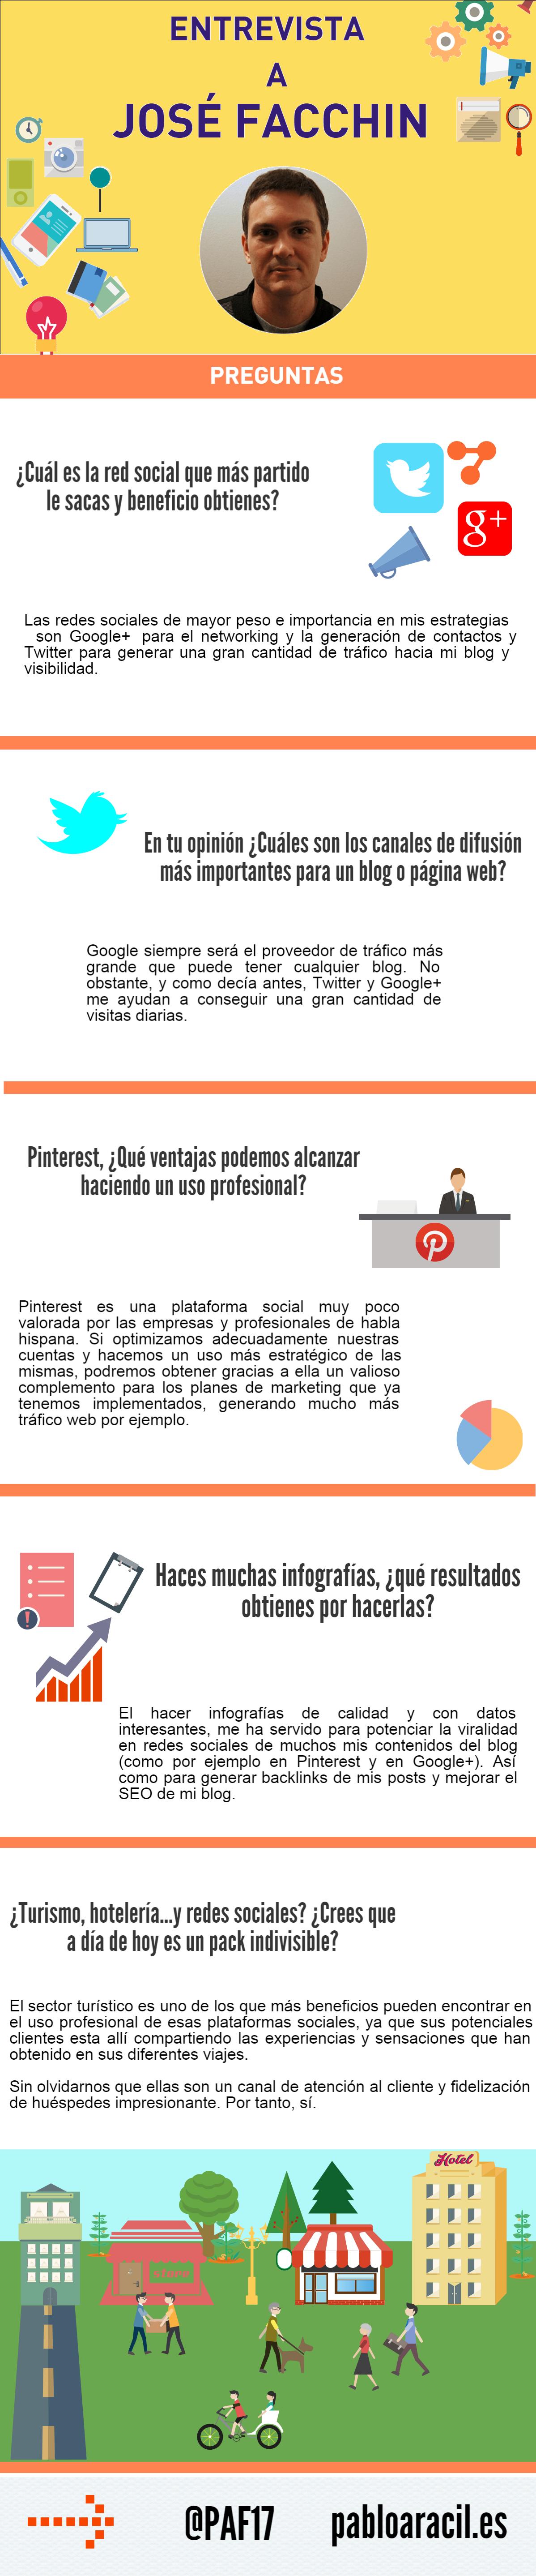 Infografia entrevista a José Facchin - copia